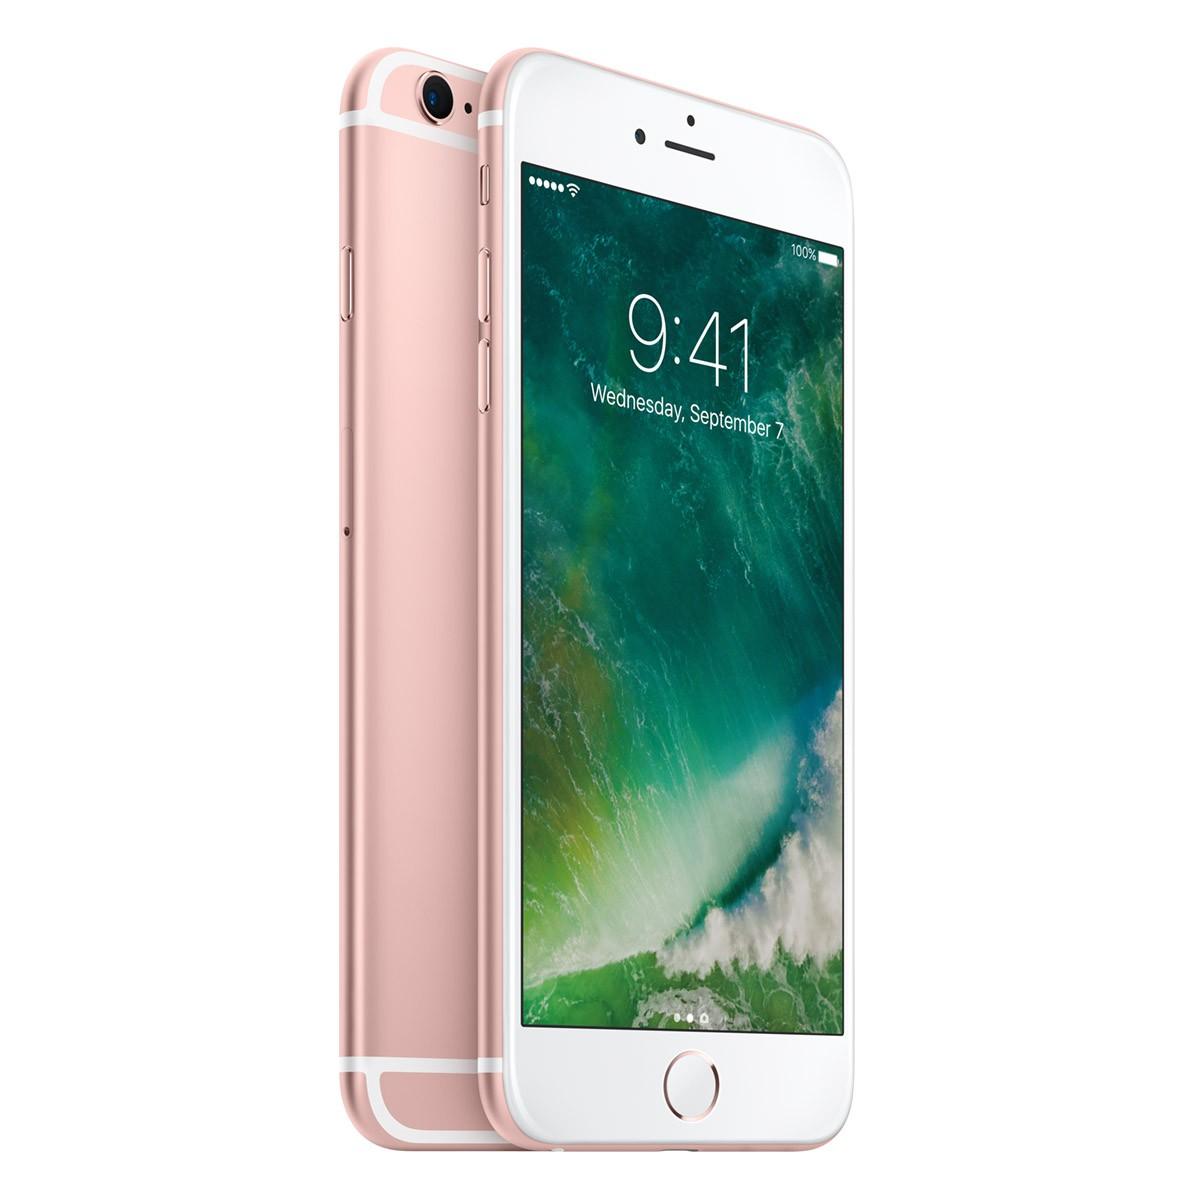 Светлорозов iPhone 6s Plus със 128 GB памет